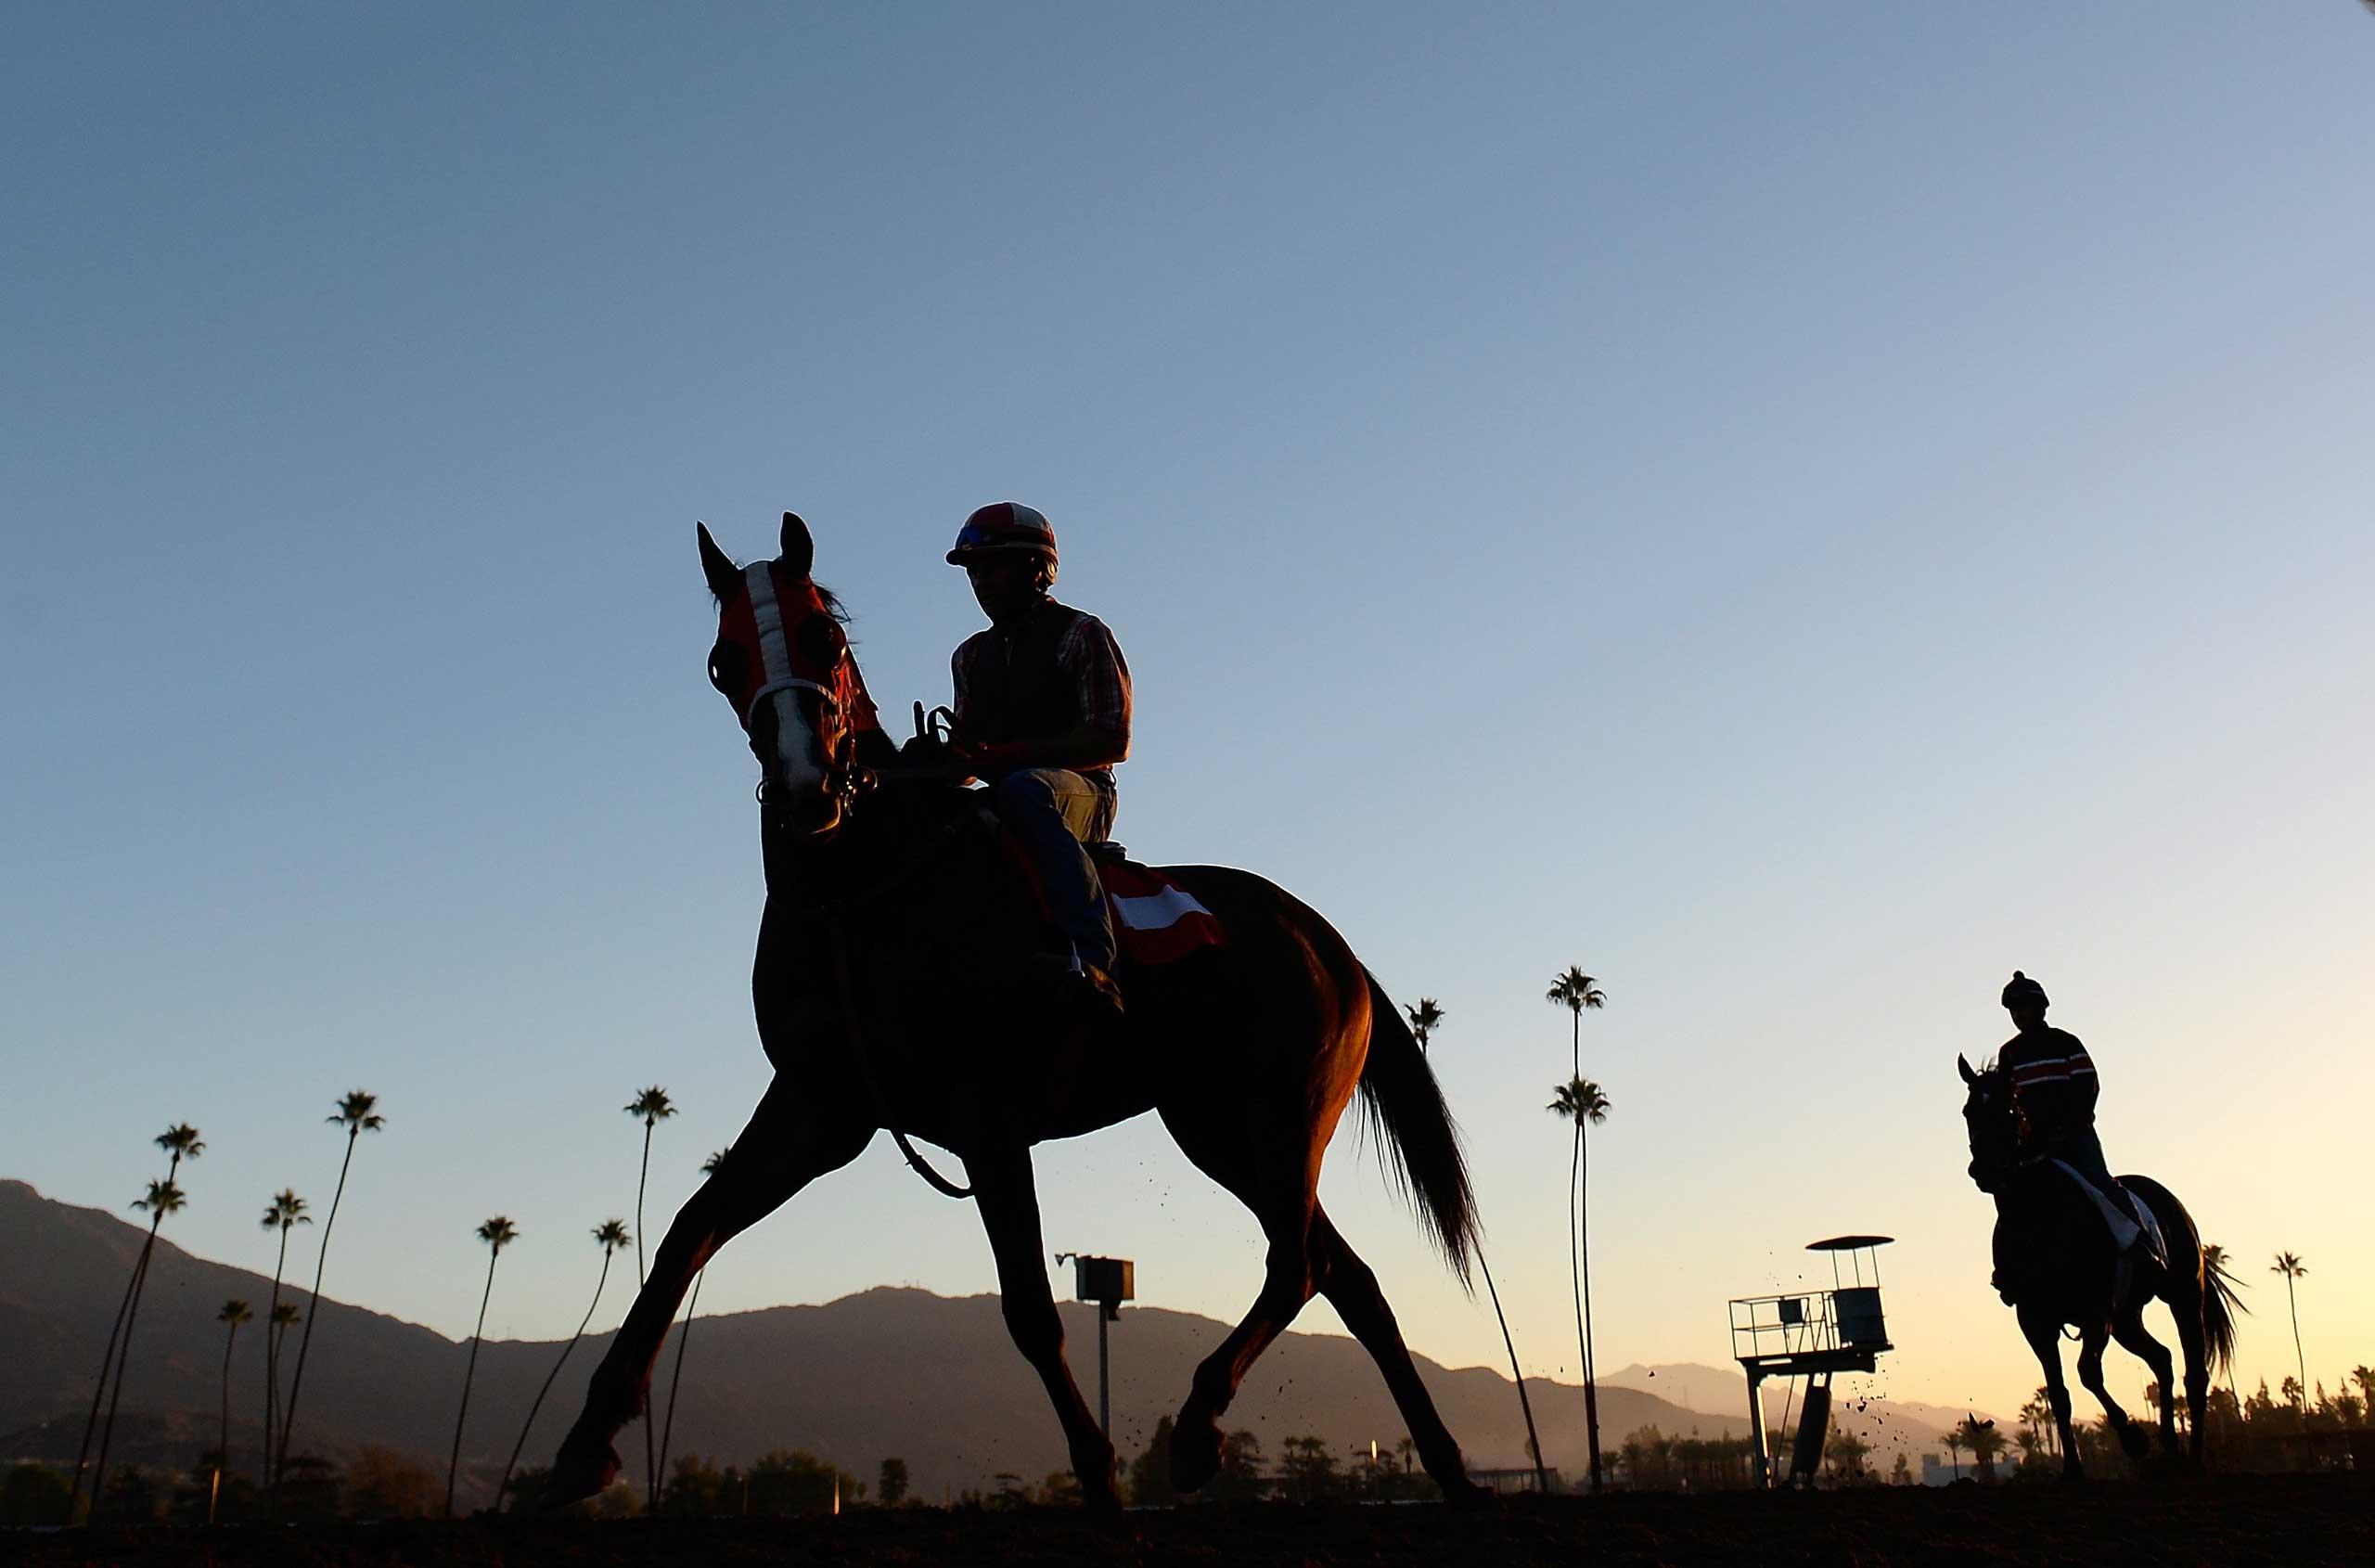 Oct. 29, 2014. Horses train in preparation for the 2014 Breeders' Cup at Santa Anita Park in Arcadia, California.